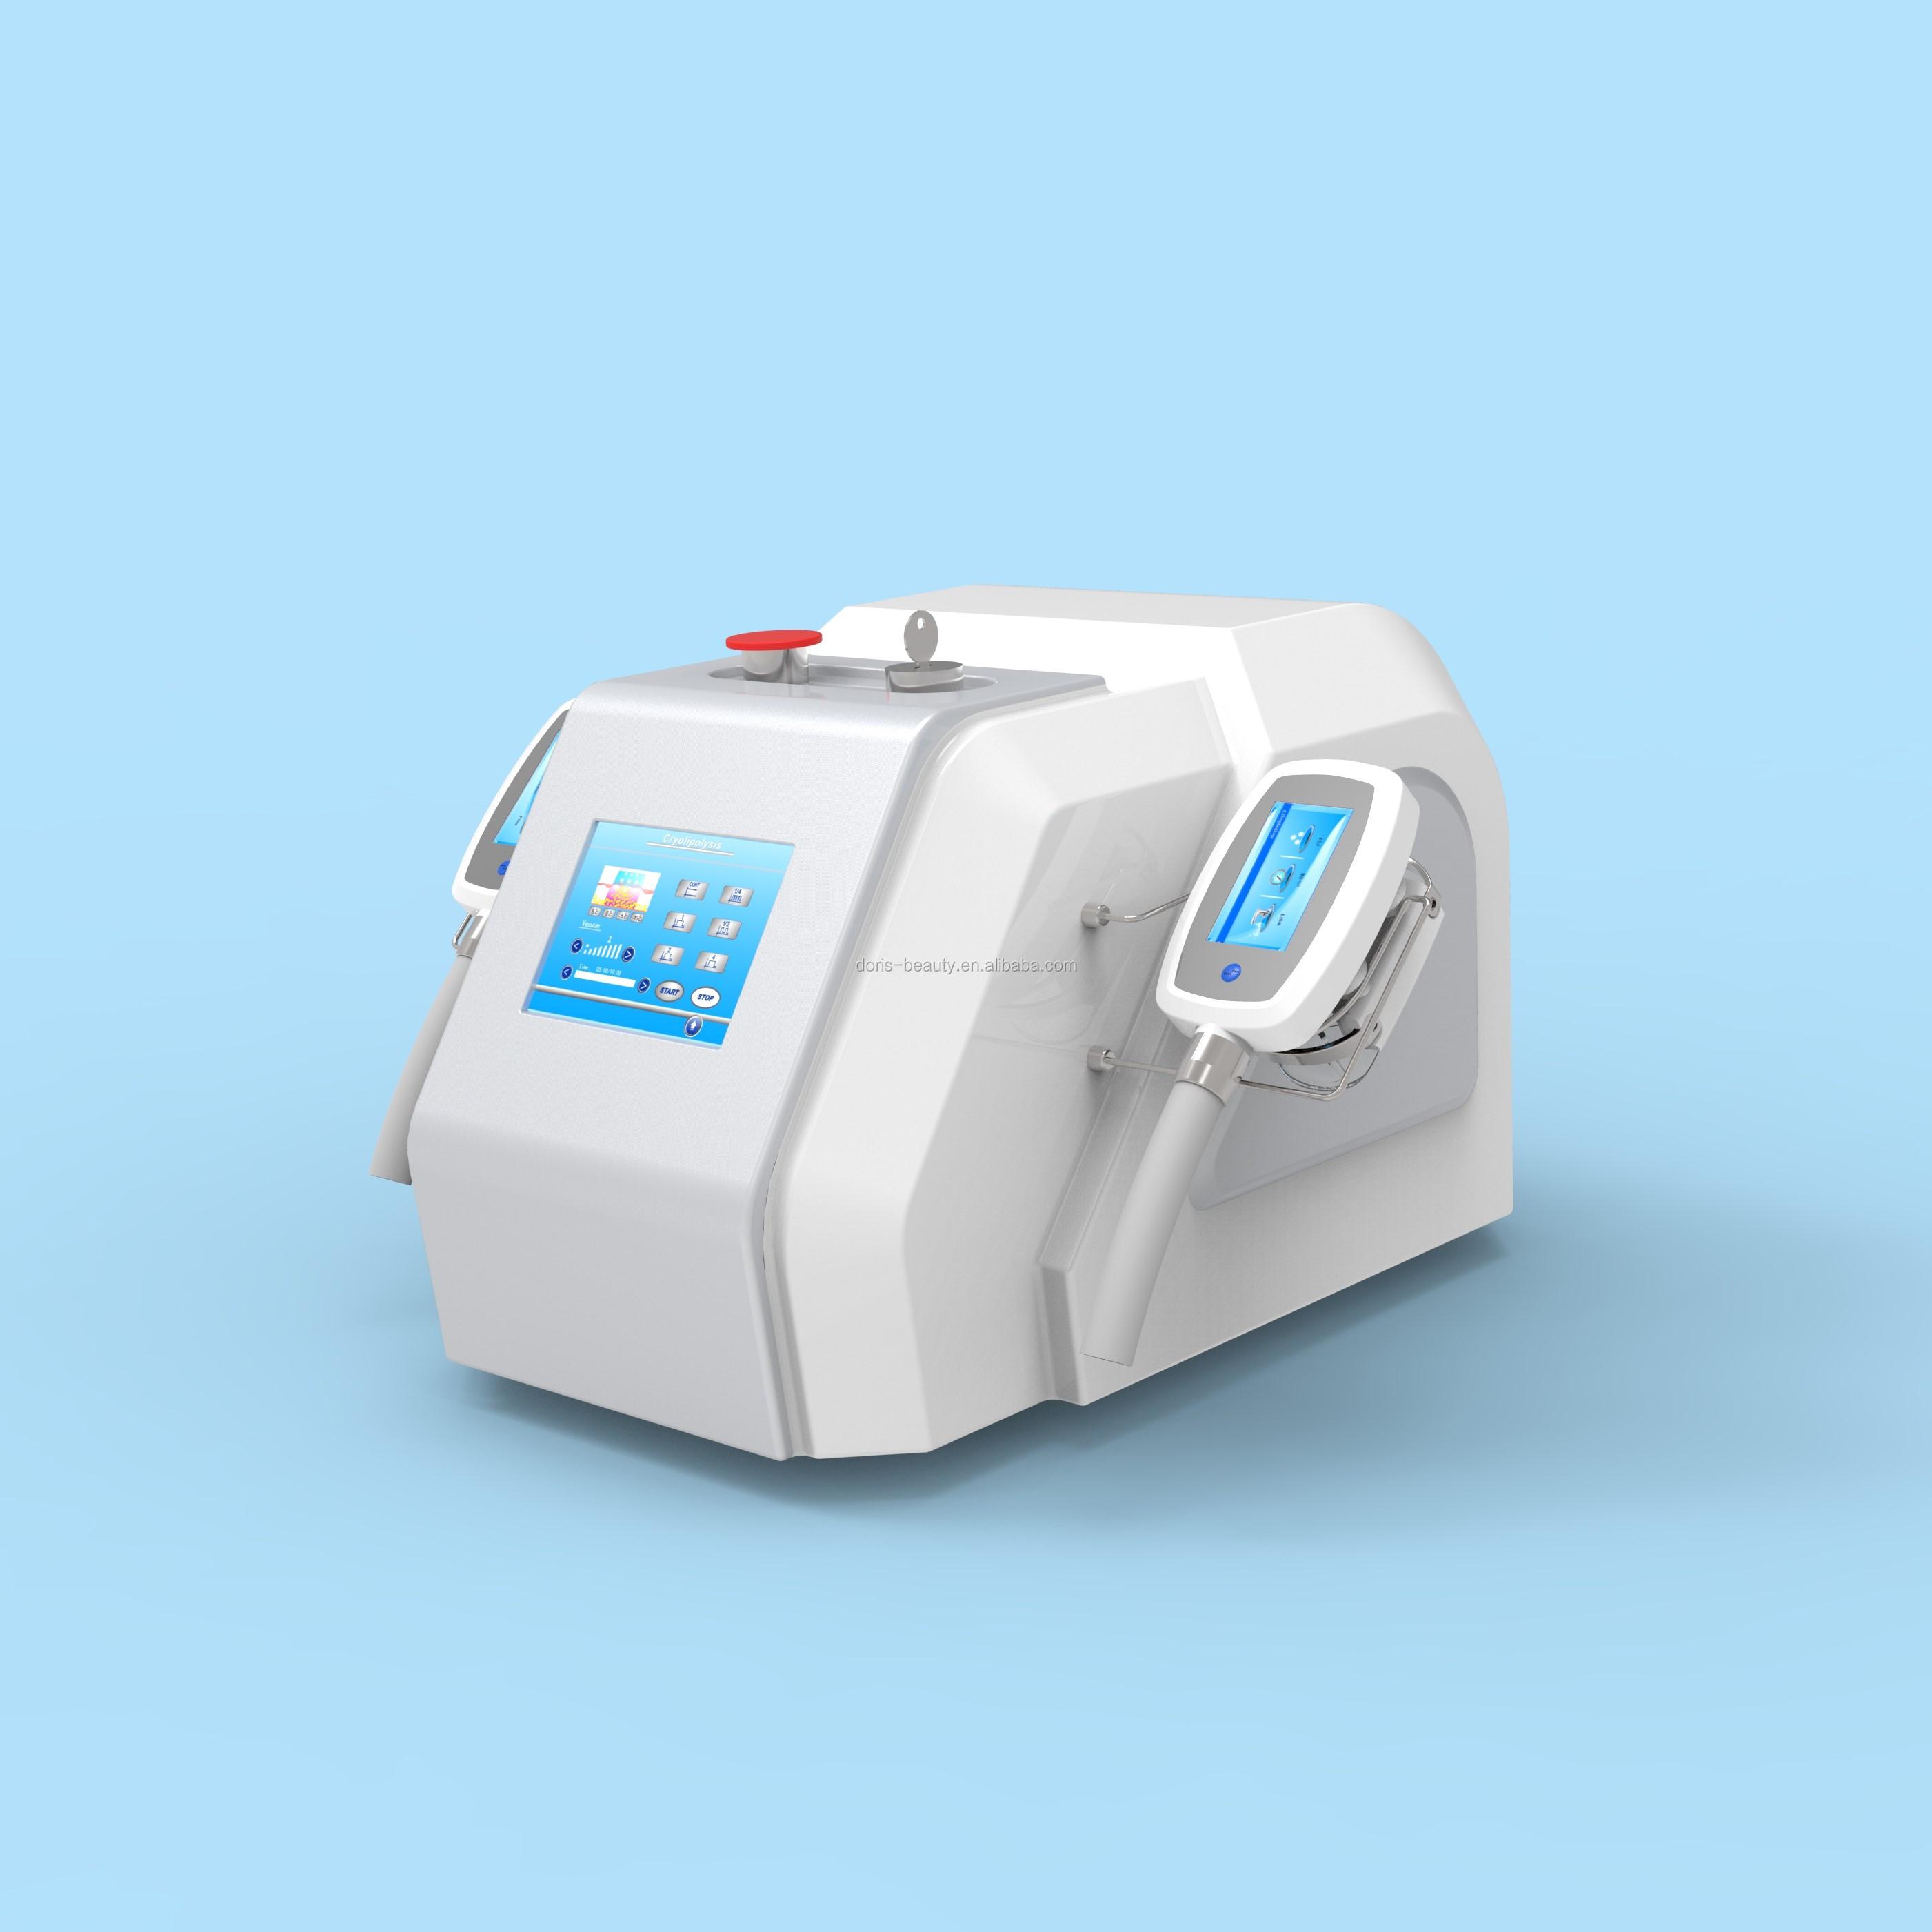 Doris Aesthetics criolipolisis fat freeze slimming machine CRYO2